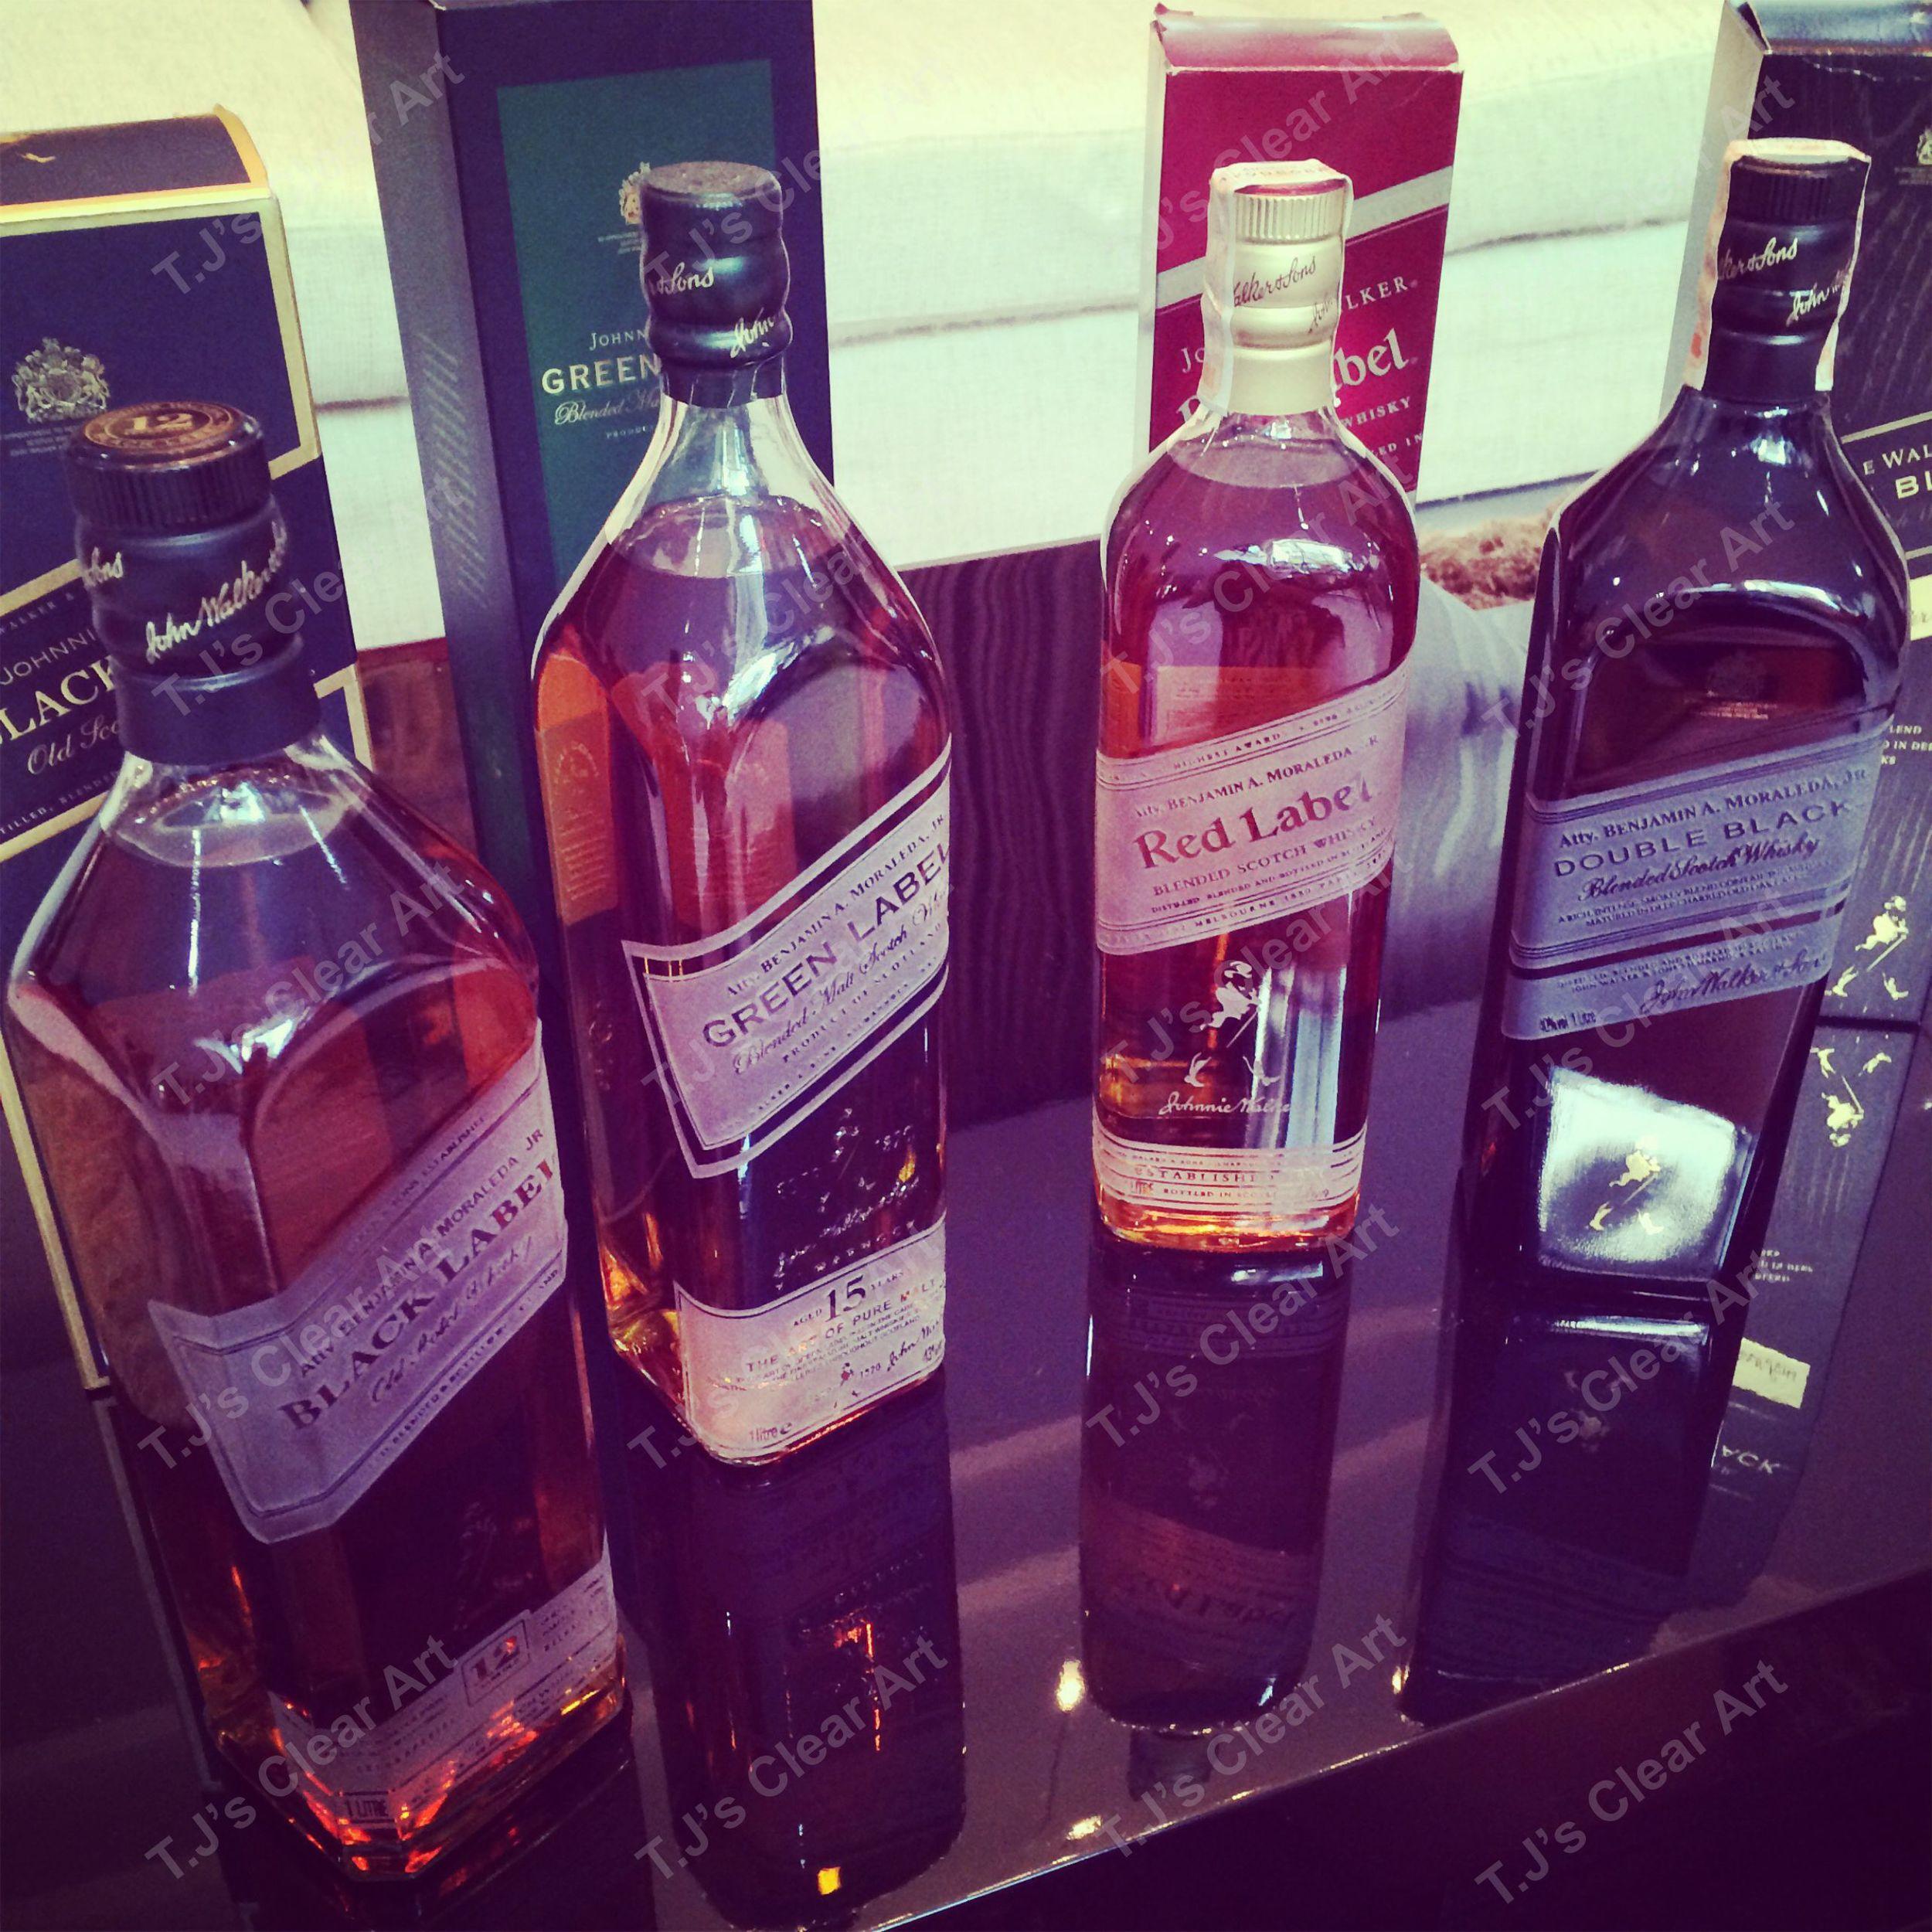 Personalized Liquor Bottles